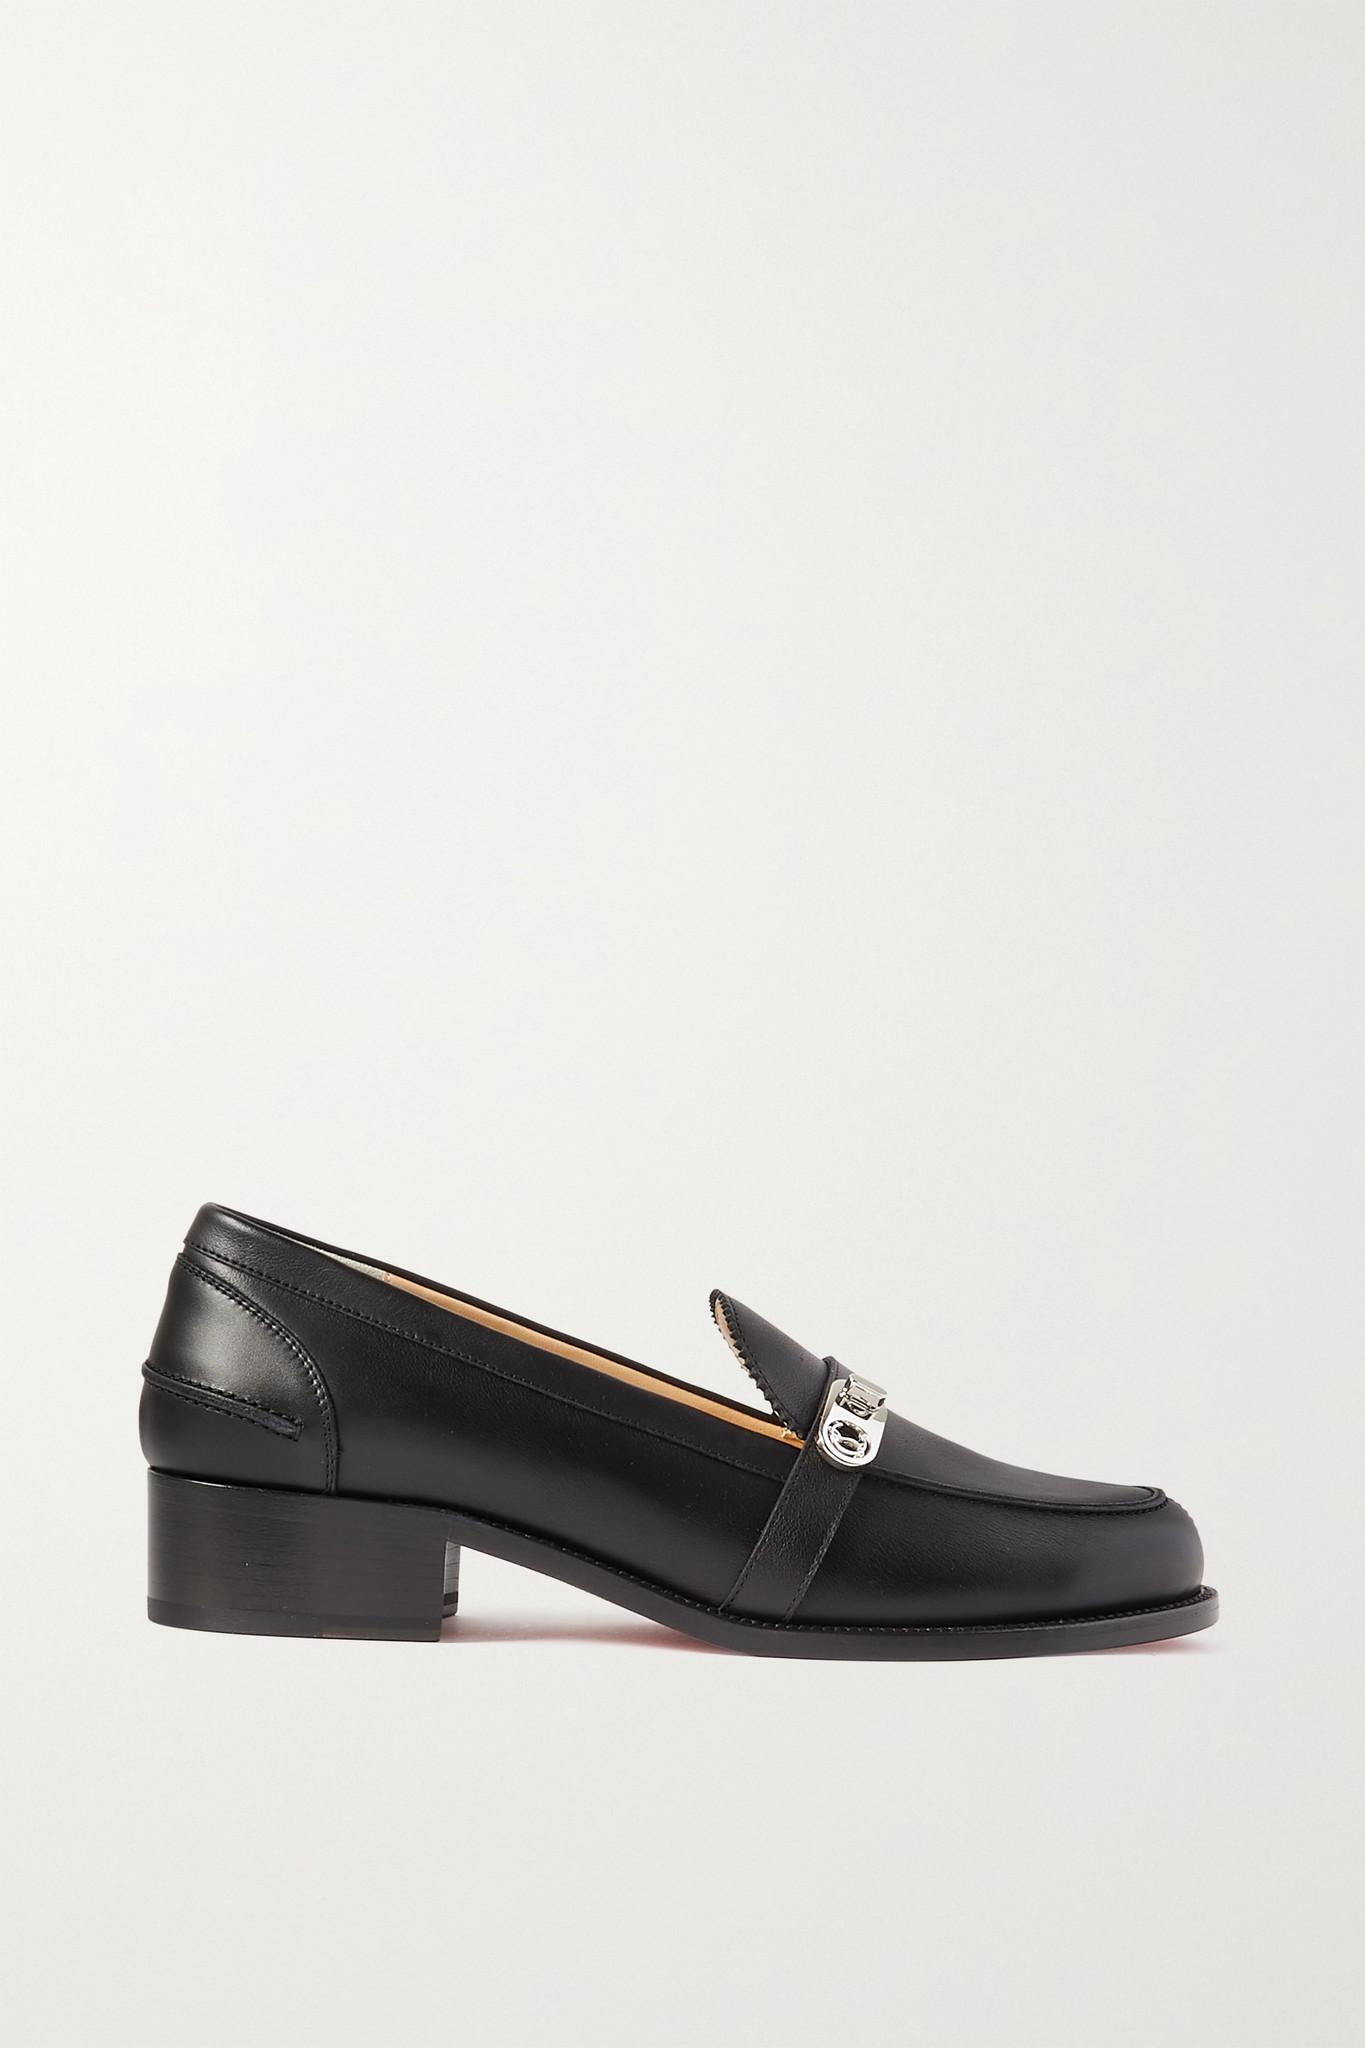 CHRISTIAN LOUBOUTIN - Lock Me Moc 45 Embellished Leather Loafers - Black - IT41